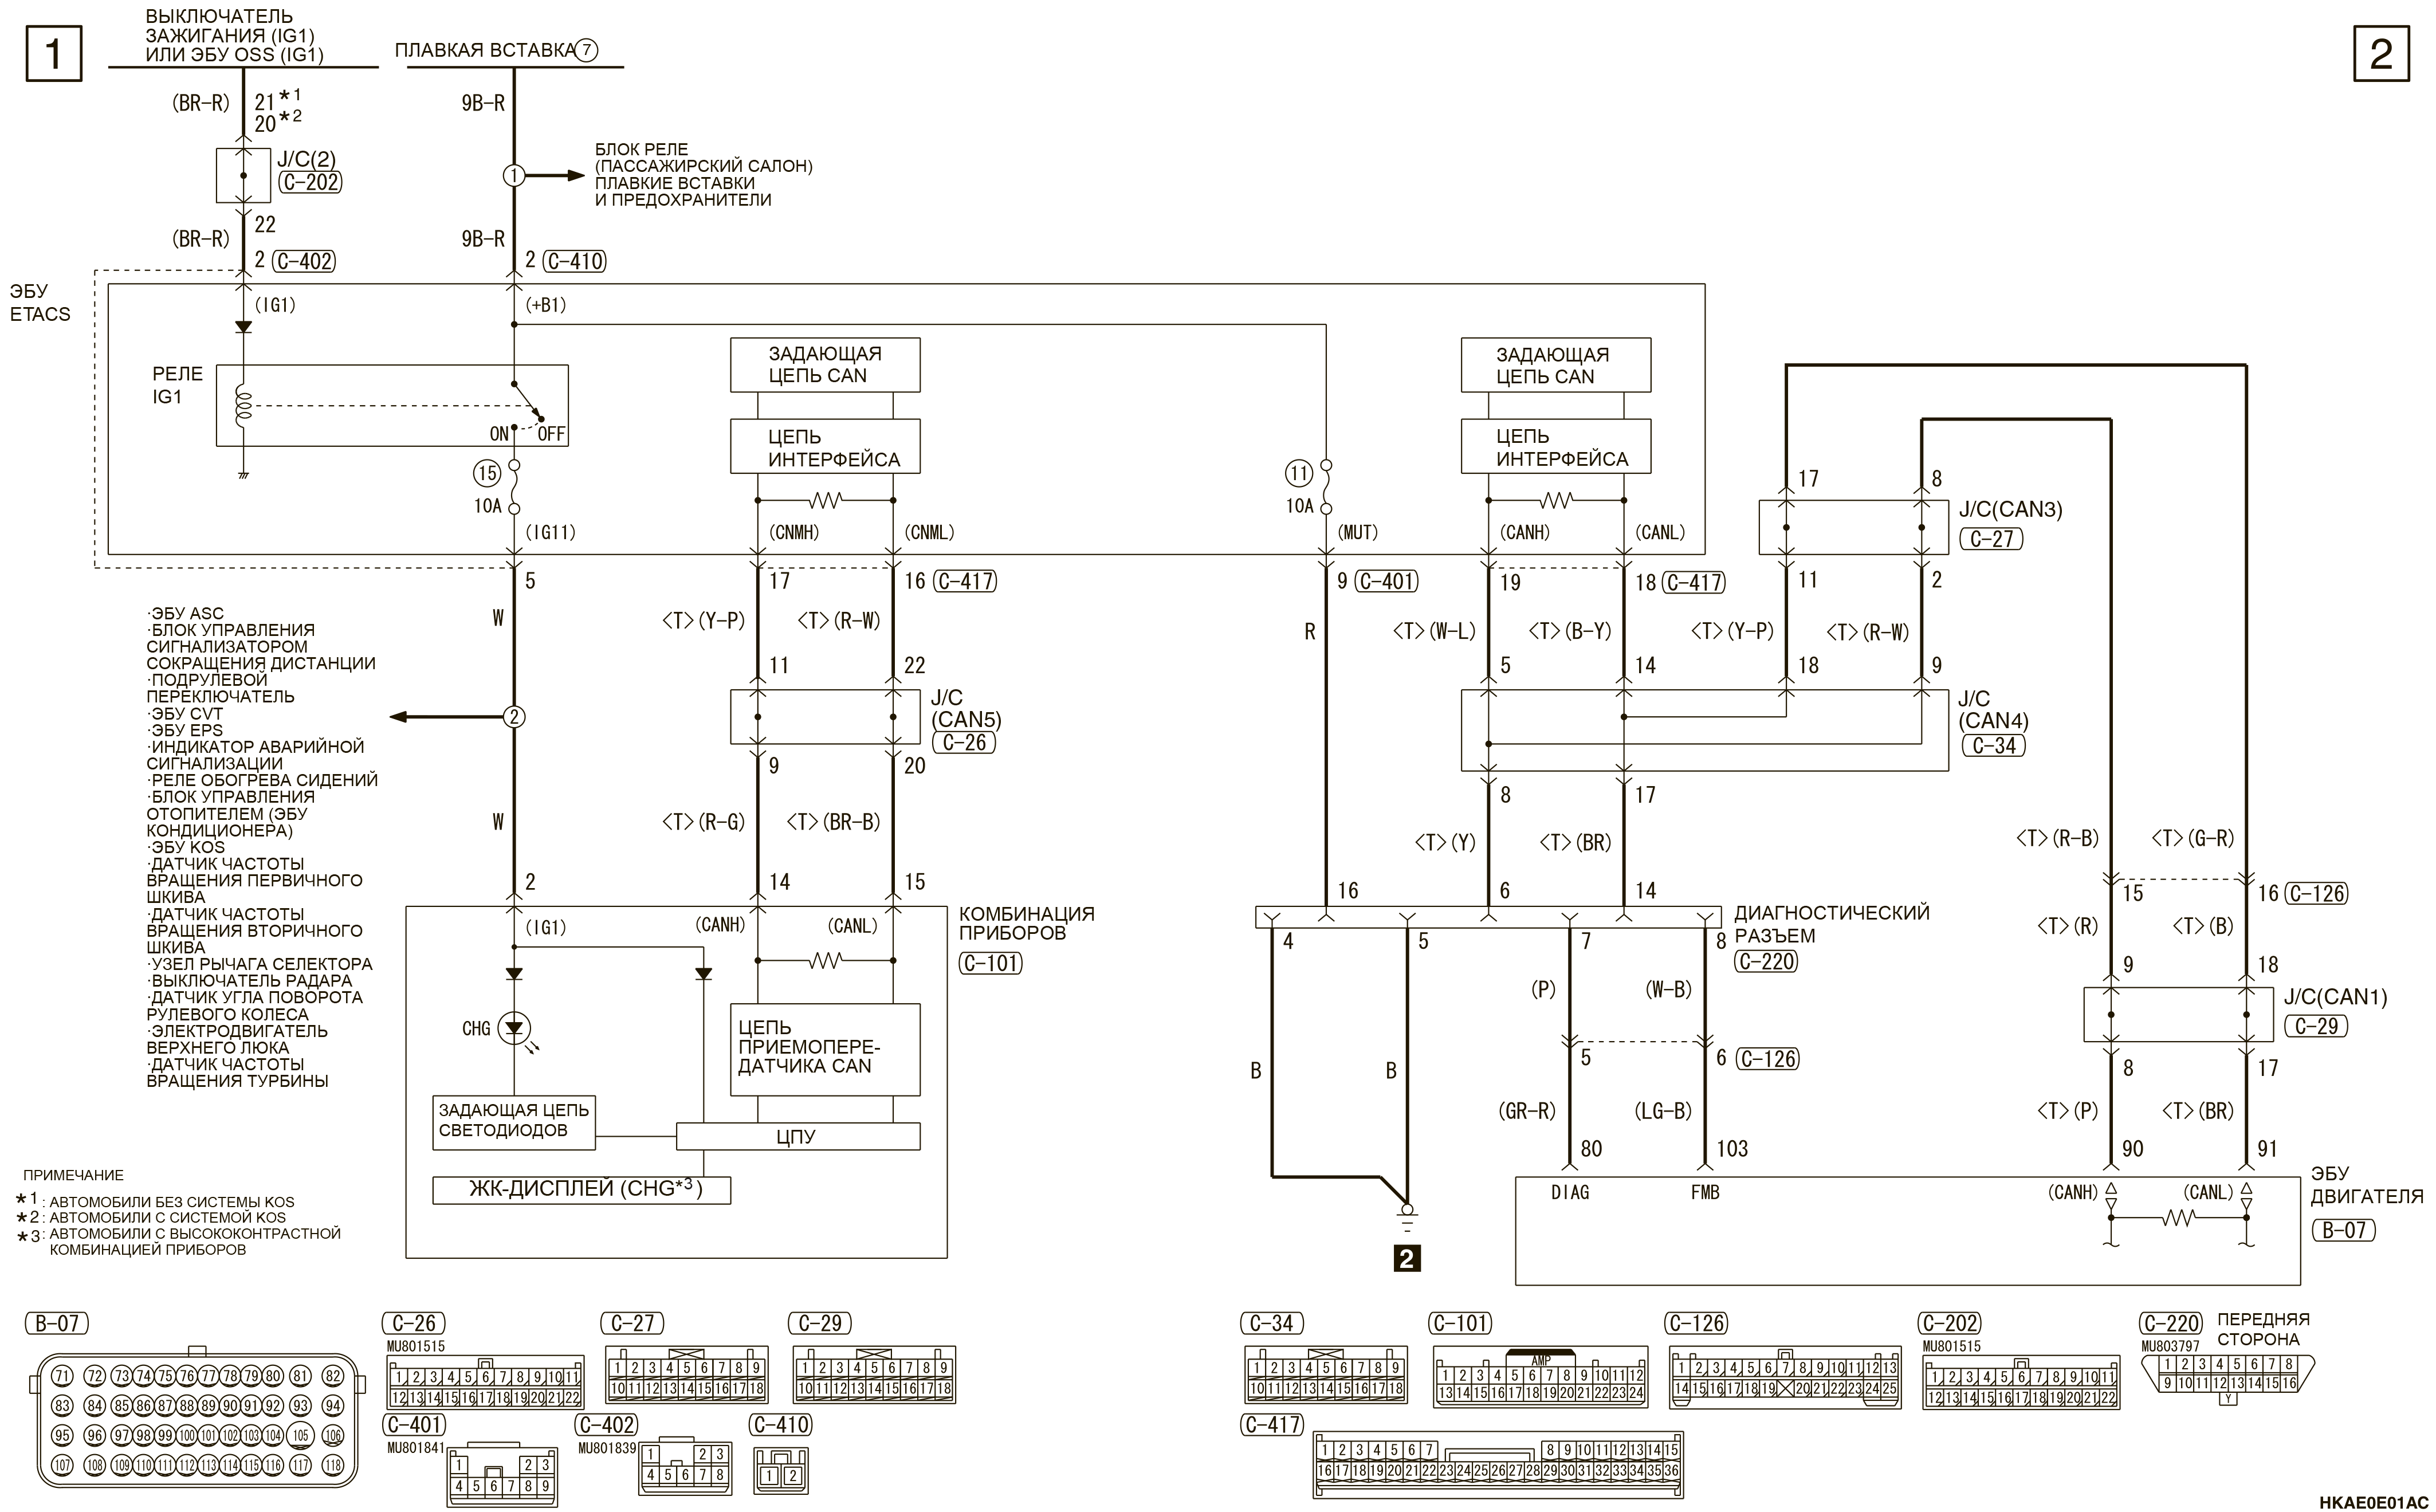 mmc аутлендер 3 2019 электросхемаСИСТЕМА ЭЛЕКТРОСНАБЖЕНИЯ 4B1 (ПРАВАЯ)